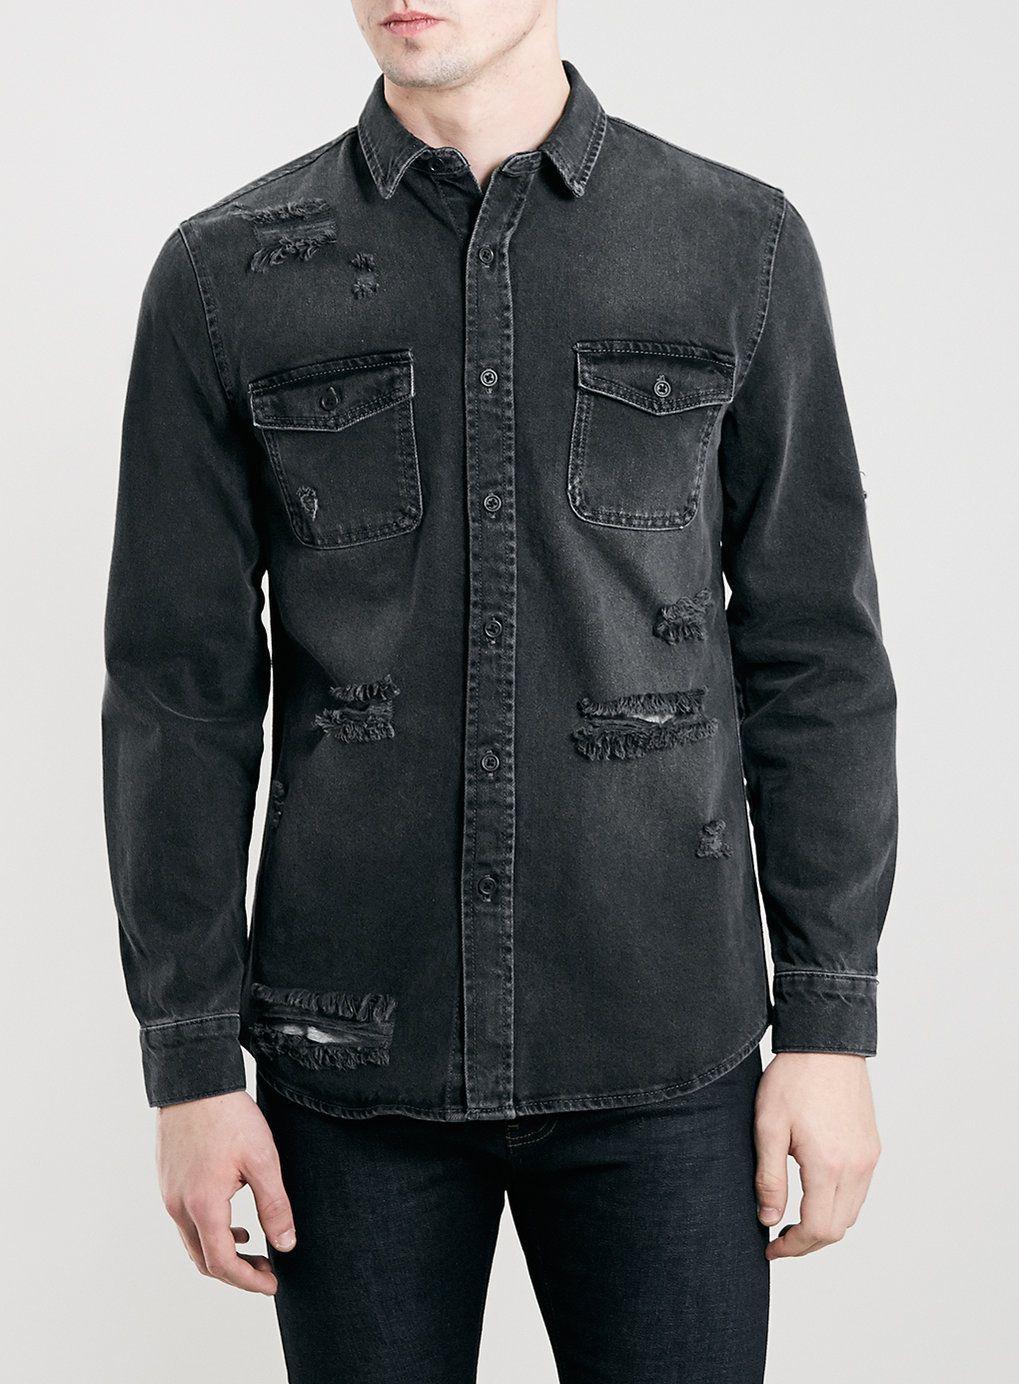 TOPMAN - Black Ripped Denim Long Sleeve Shirt | Wish List ...